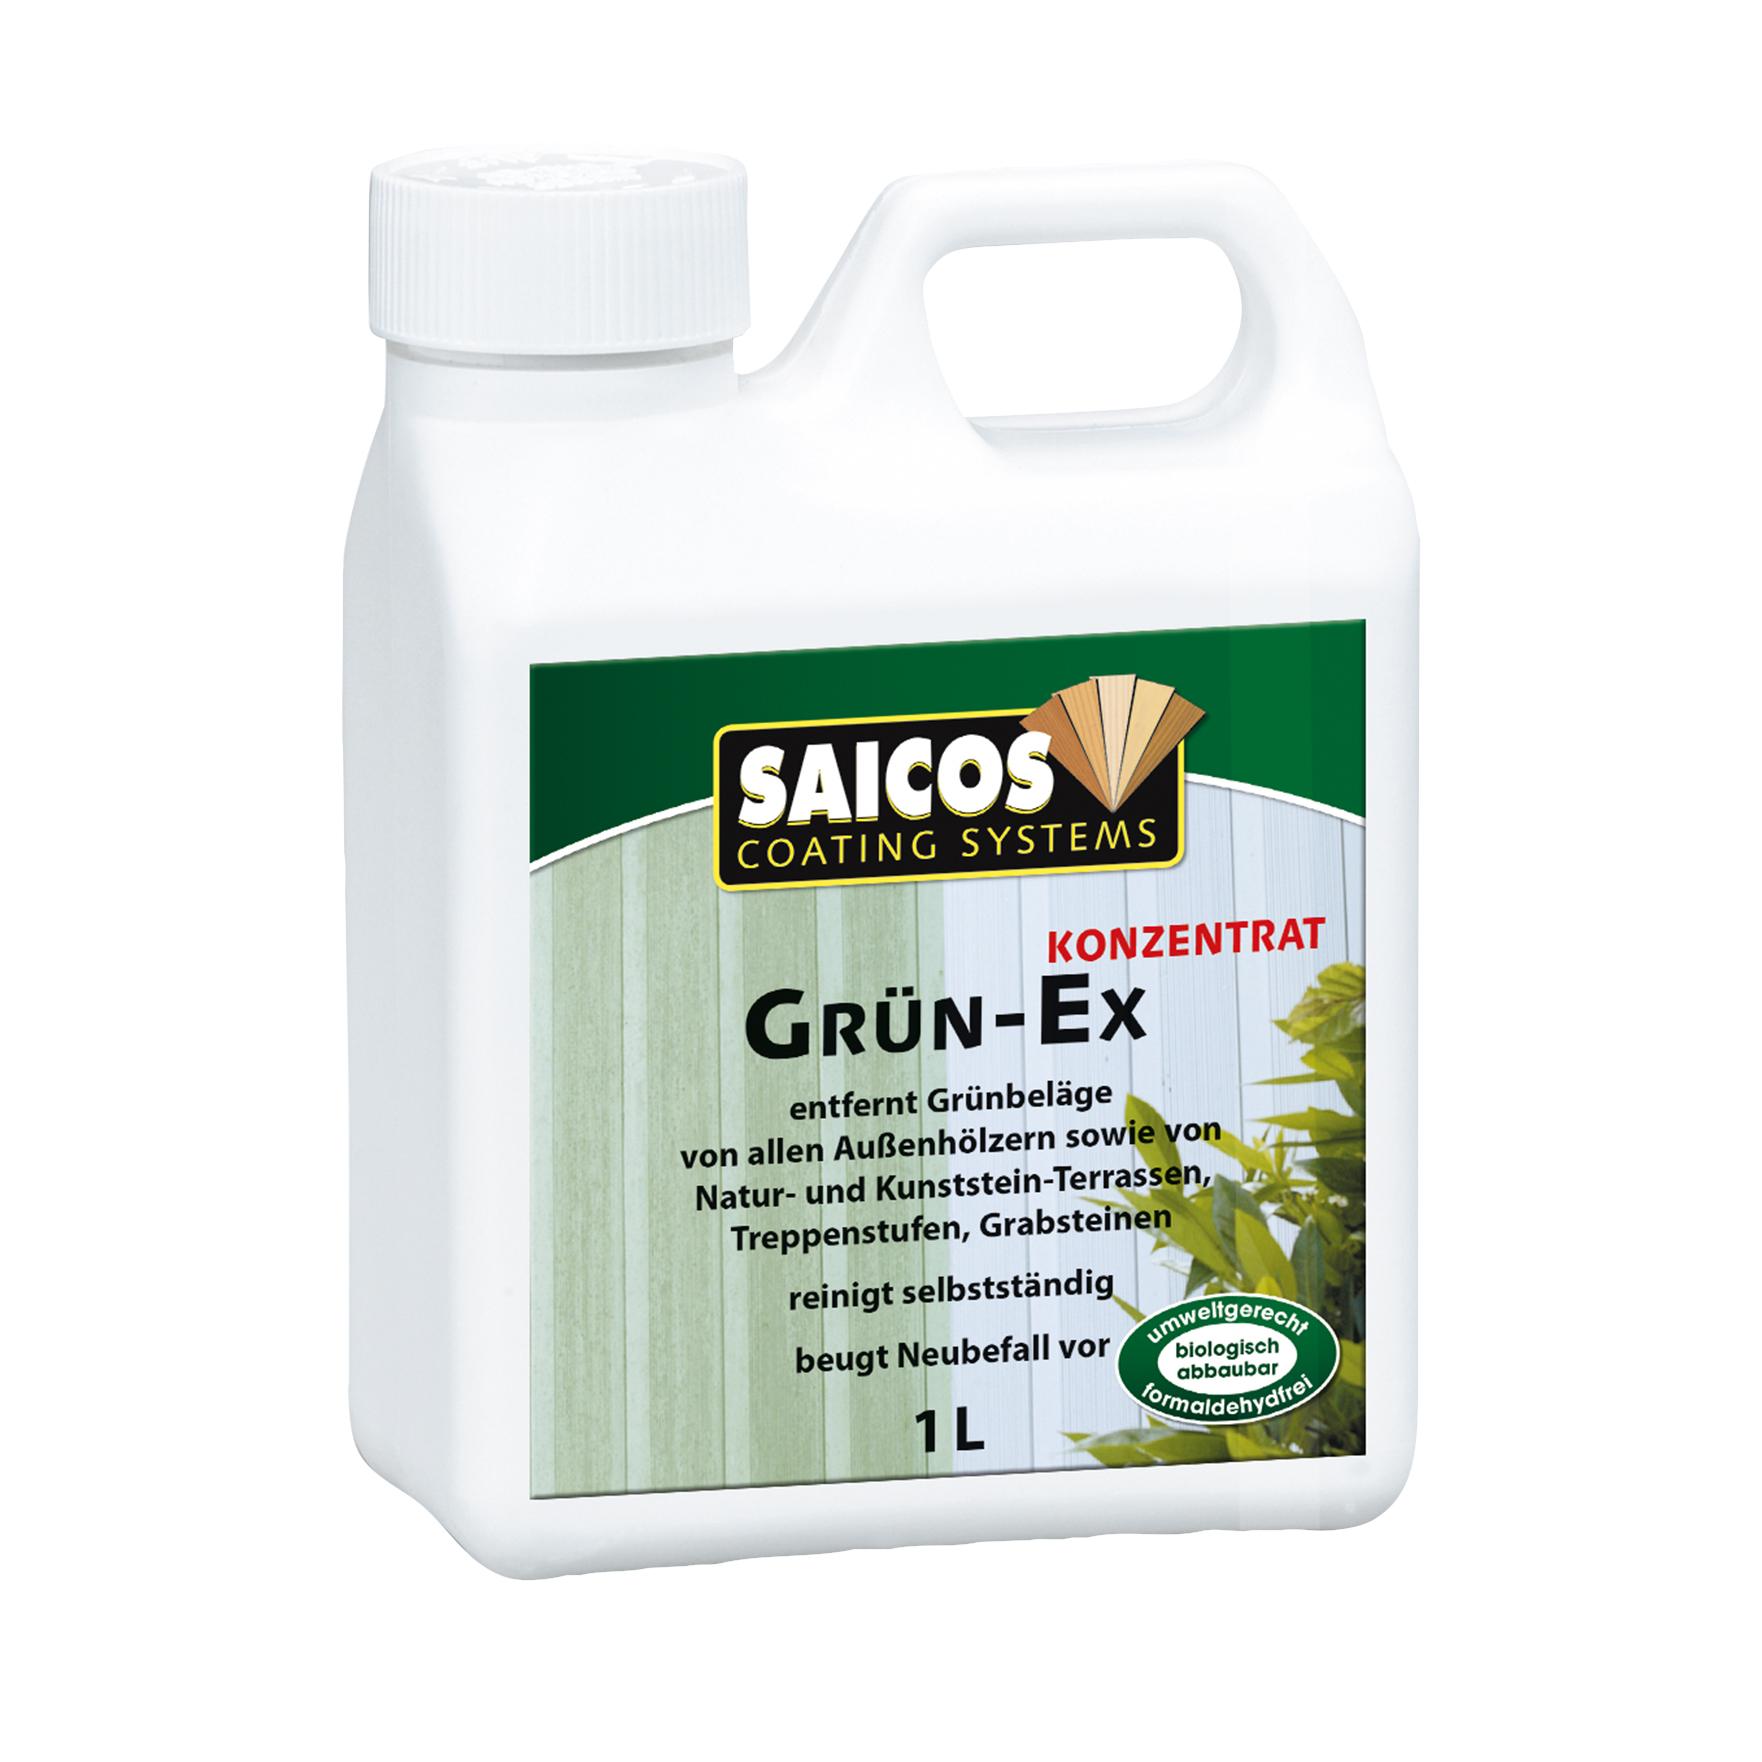 SAICOS Holz-Grün-Ex Konzentrat 1 Ltr.